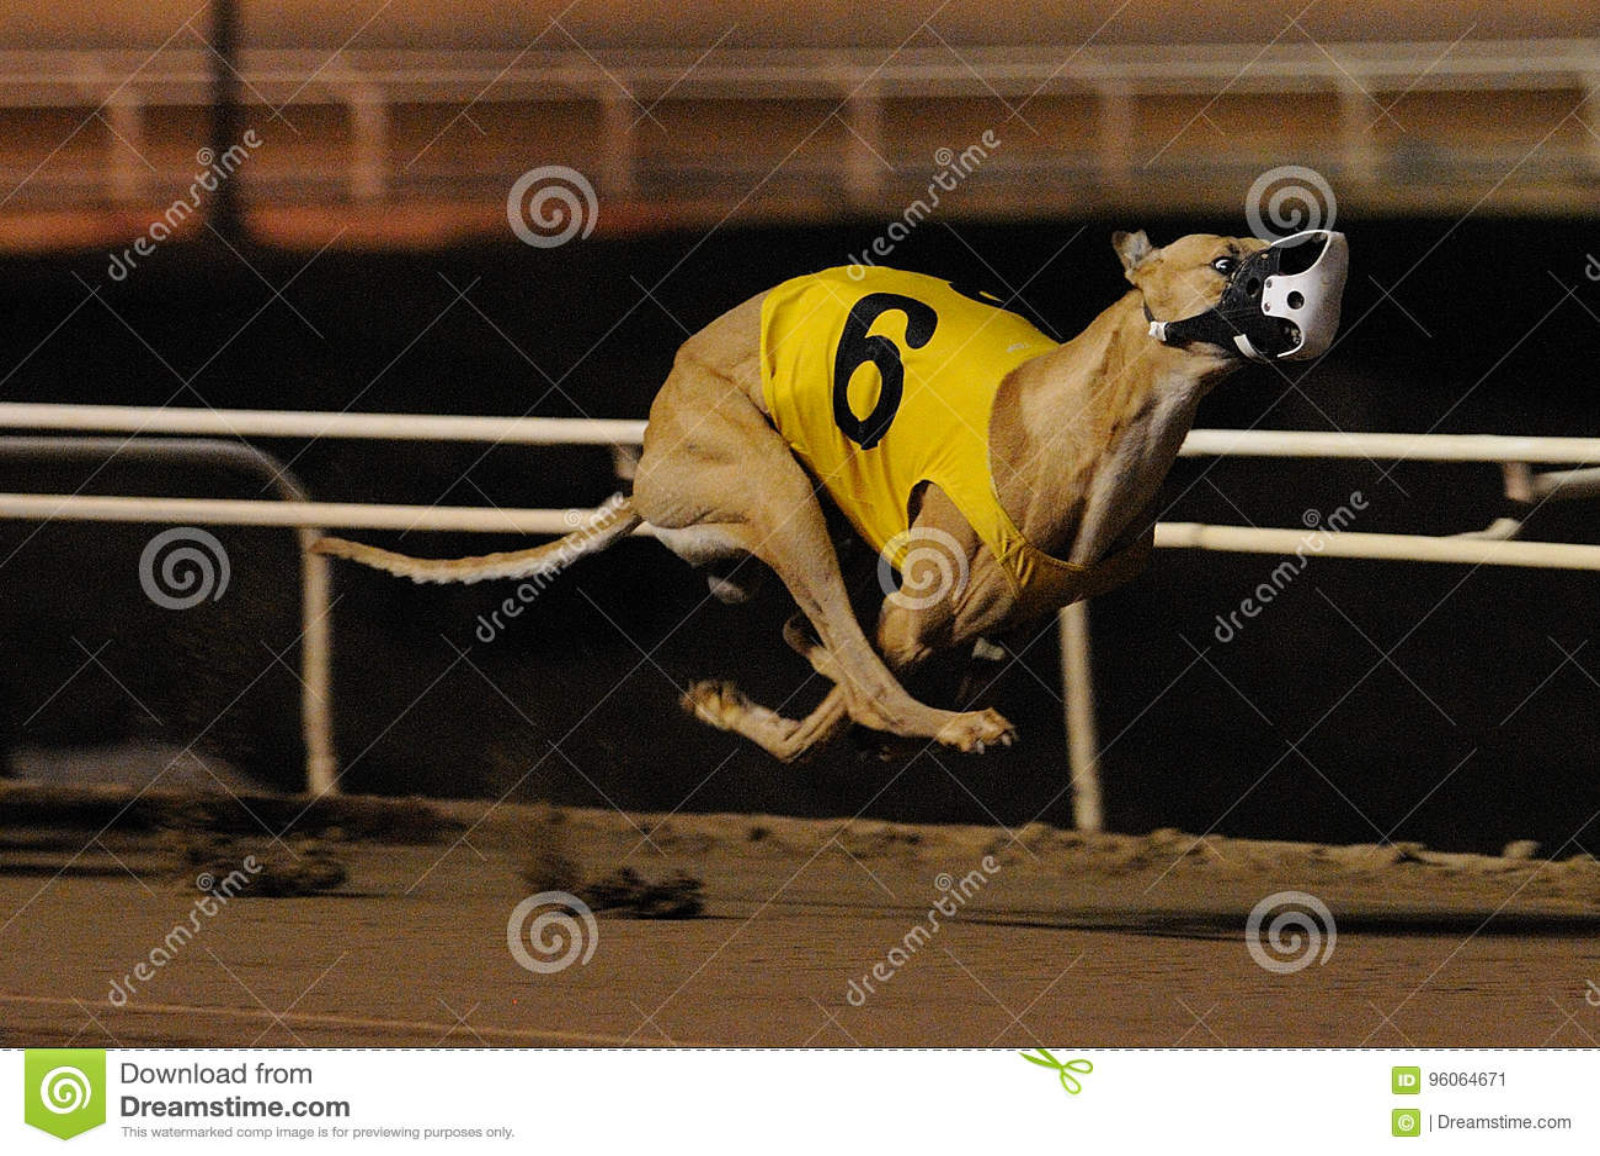 dog racing phoenix